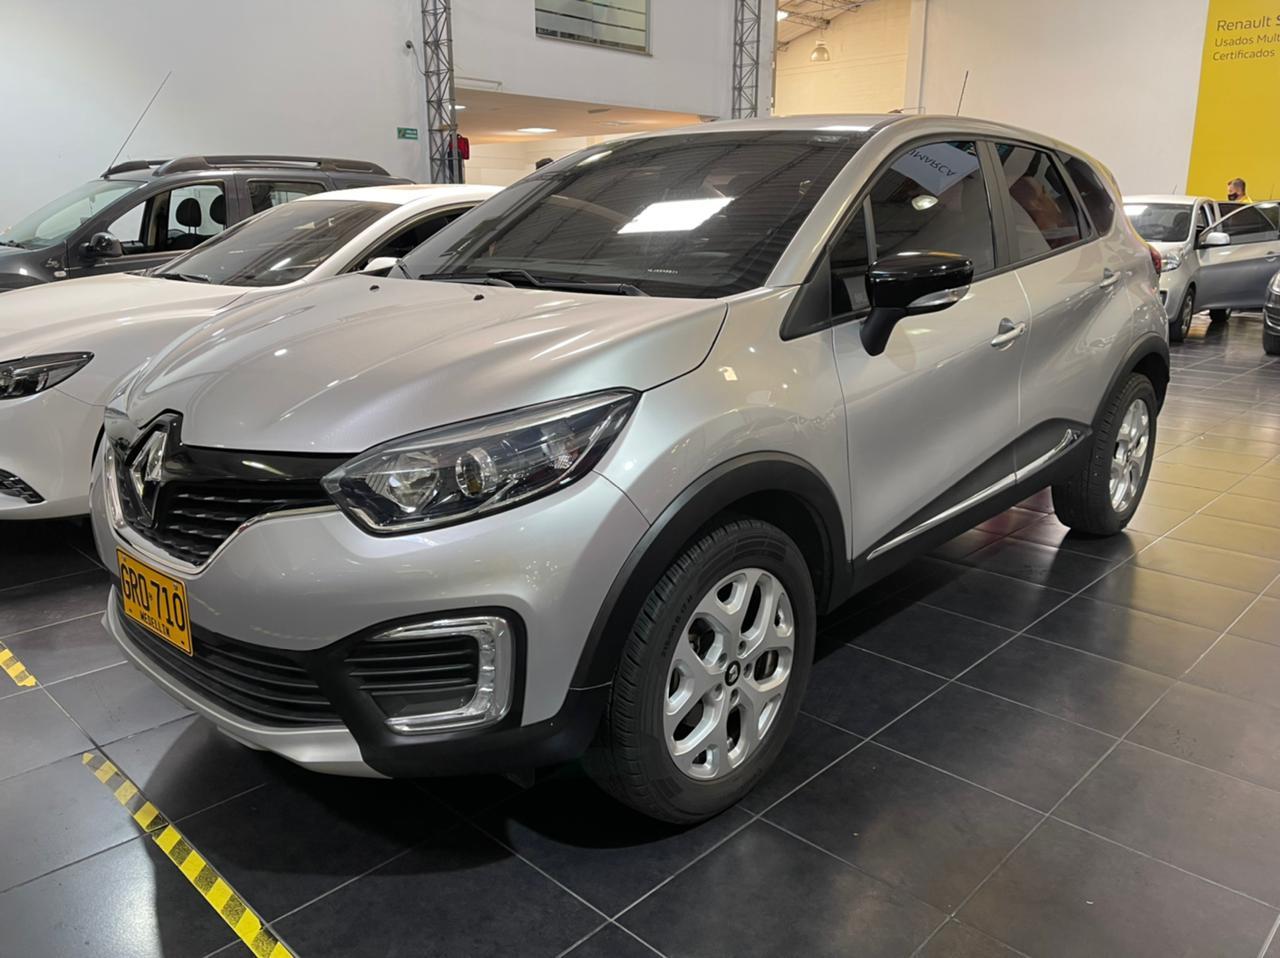 Renault-Captur-01444306-1